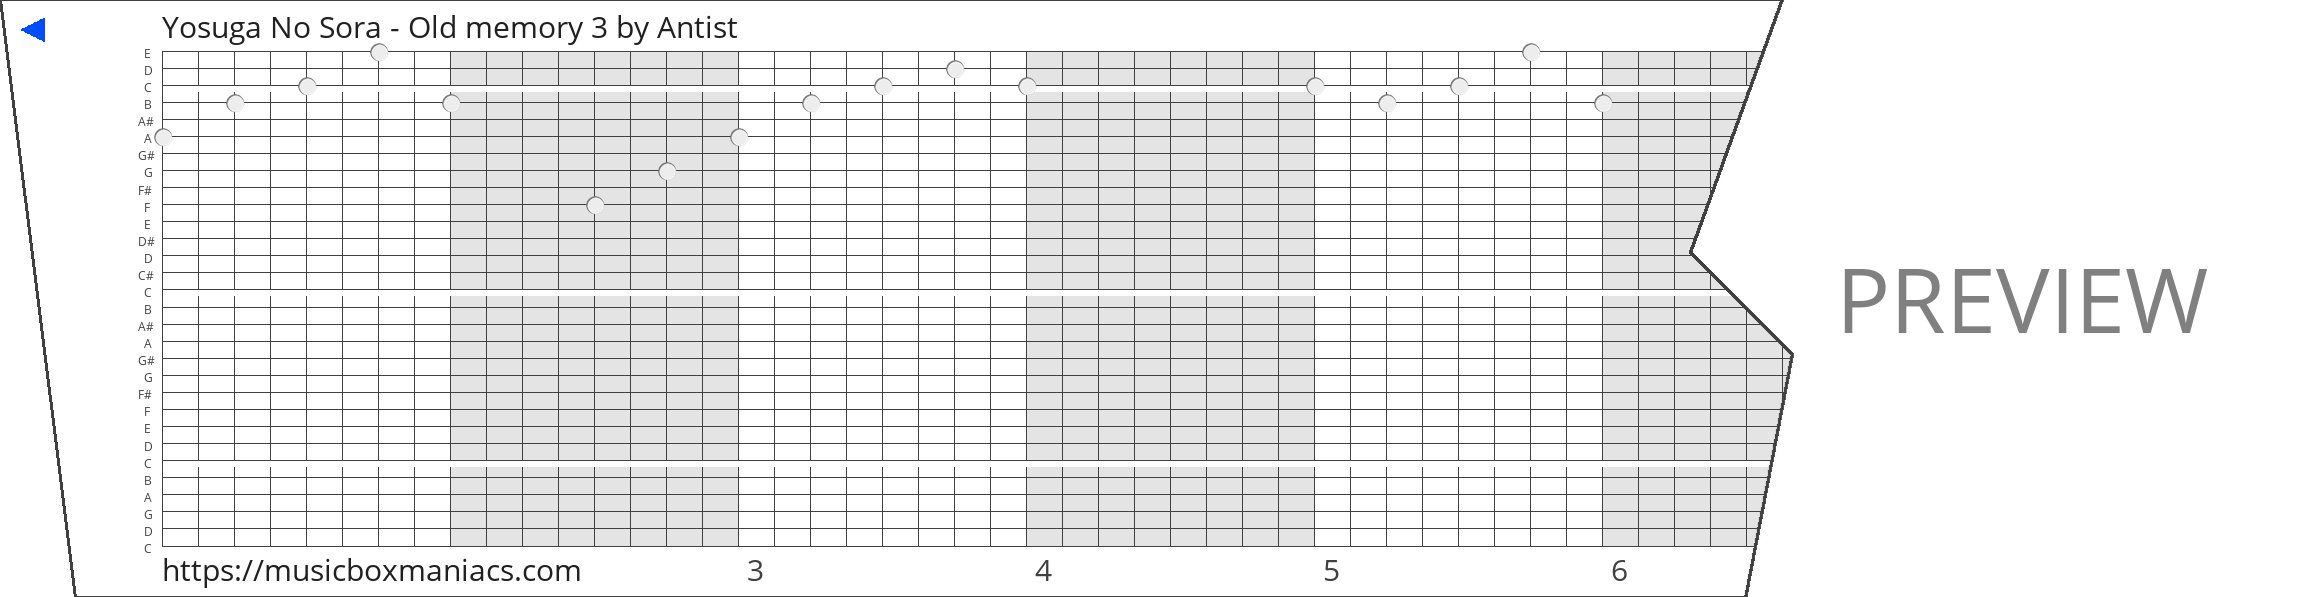 Yosuga No Sora - Old memory 3 30 note music box paper strip